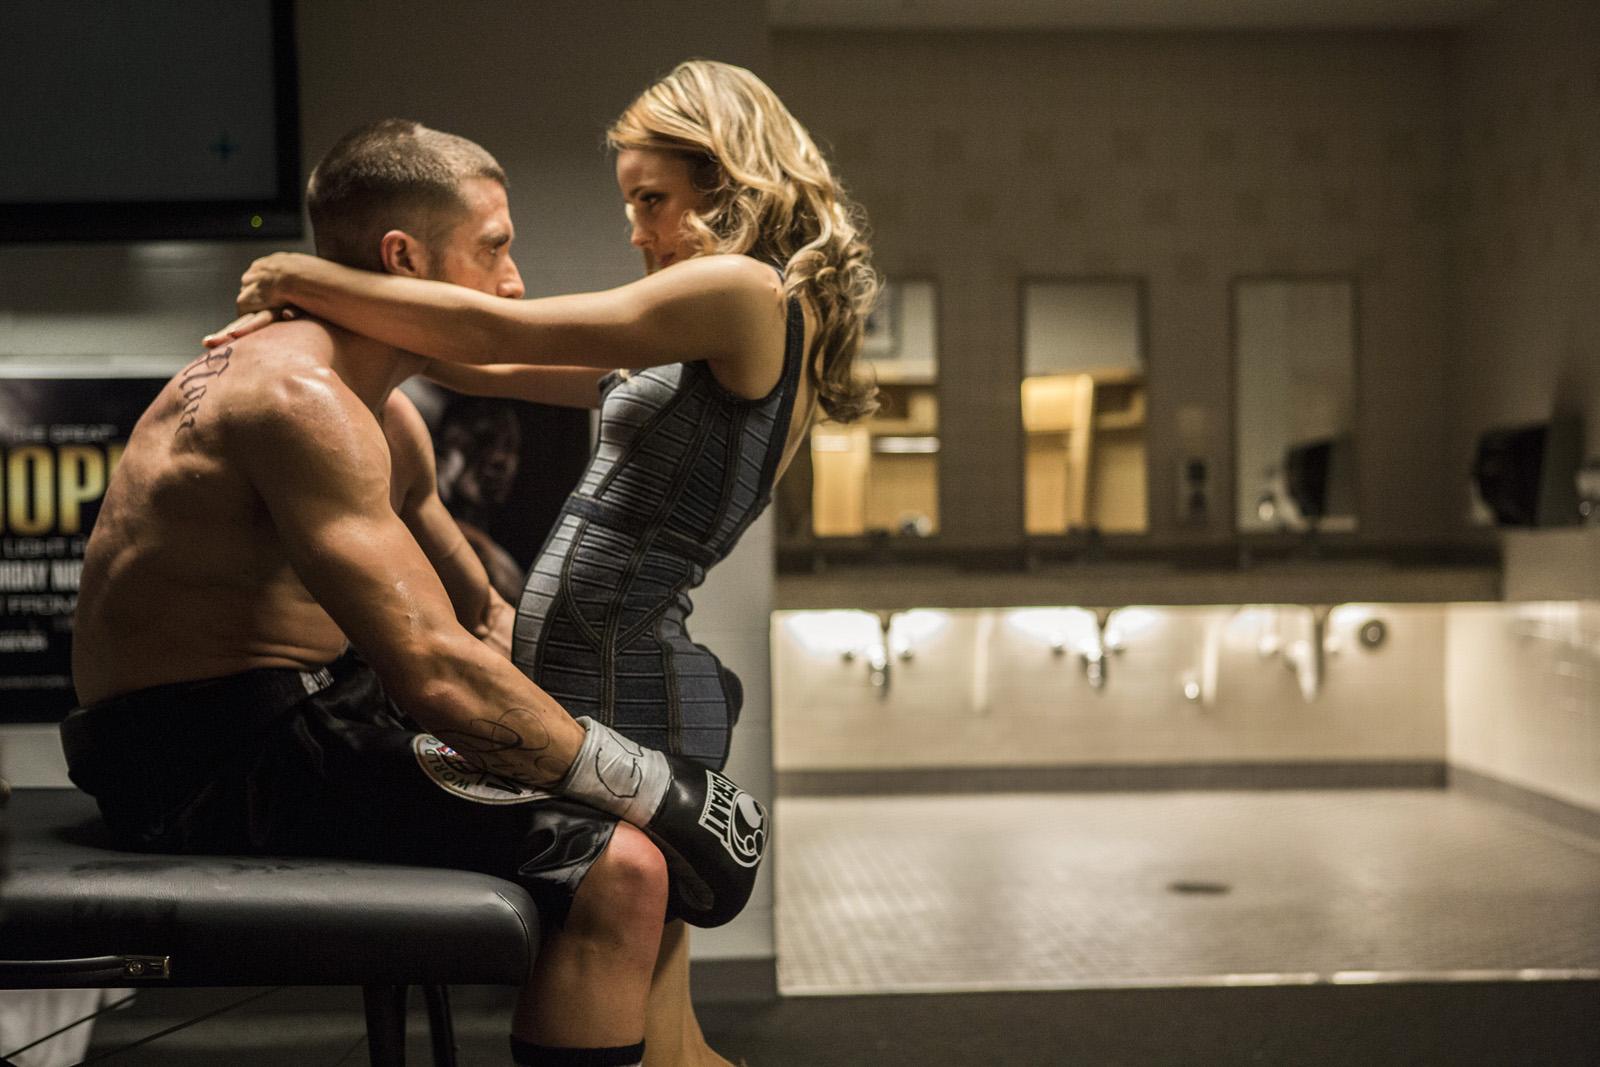 Jake Gyllenhaal and Rachel McAdams in Southpaw (2015)